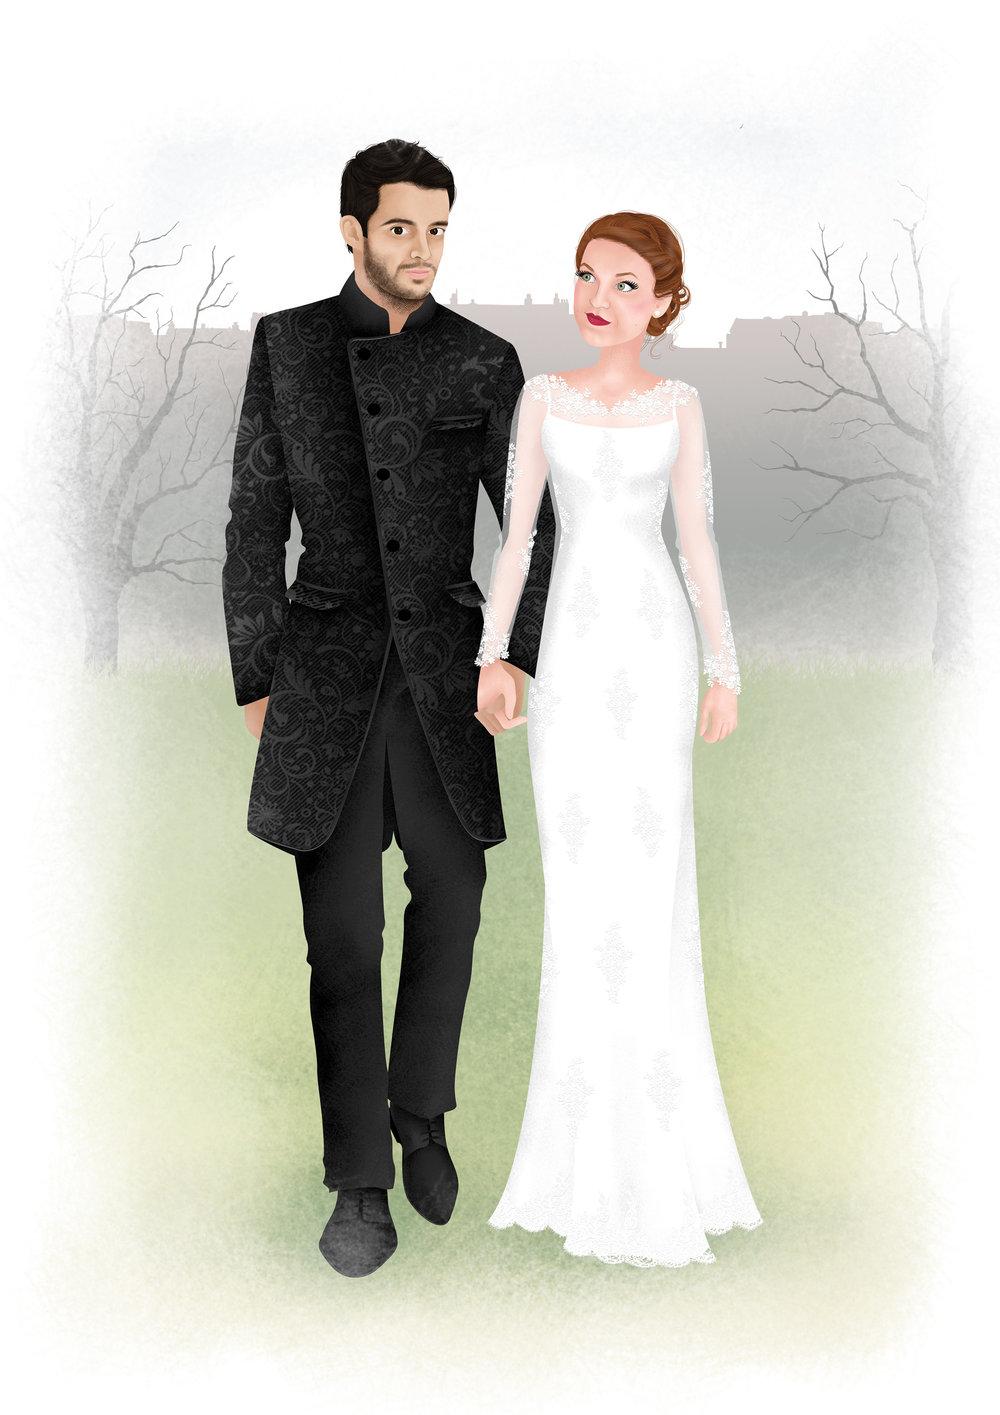 Hannah-Weeks-For Joseph Malik - Wedding Portrait - A4.jpg